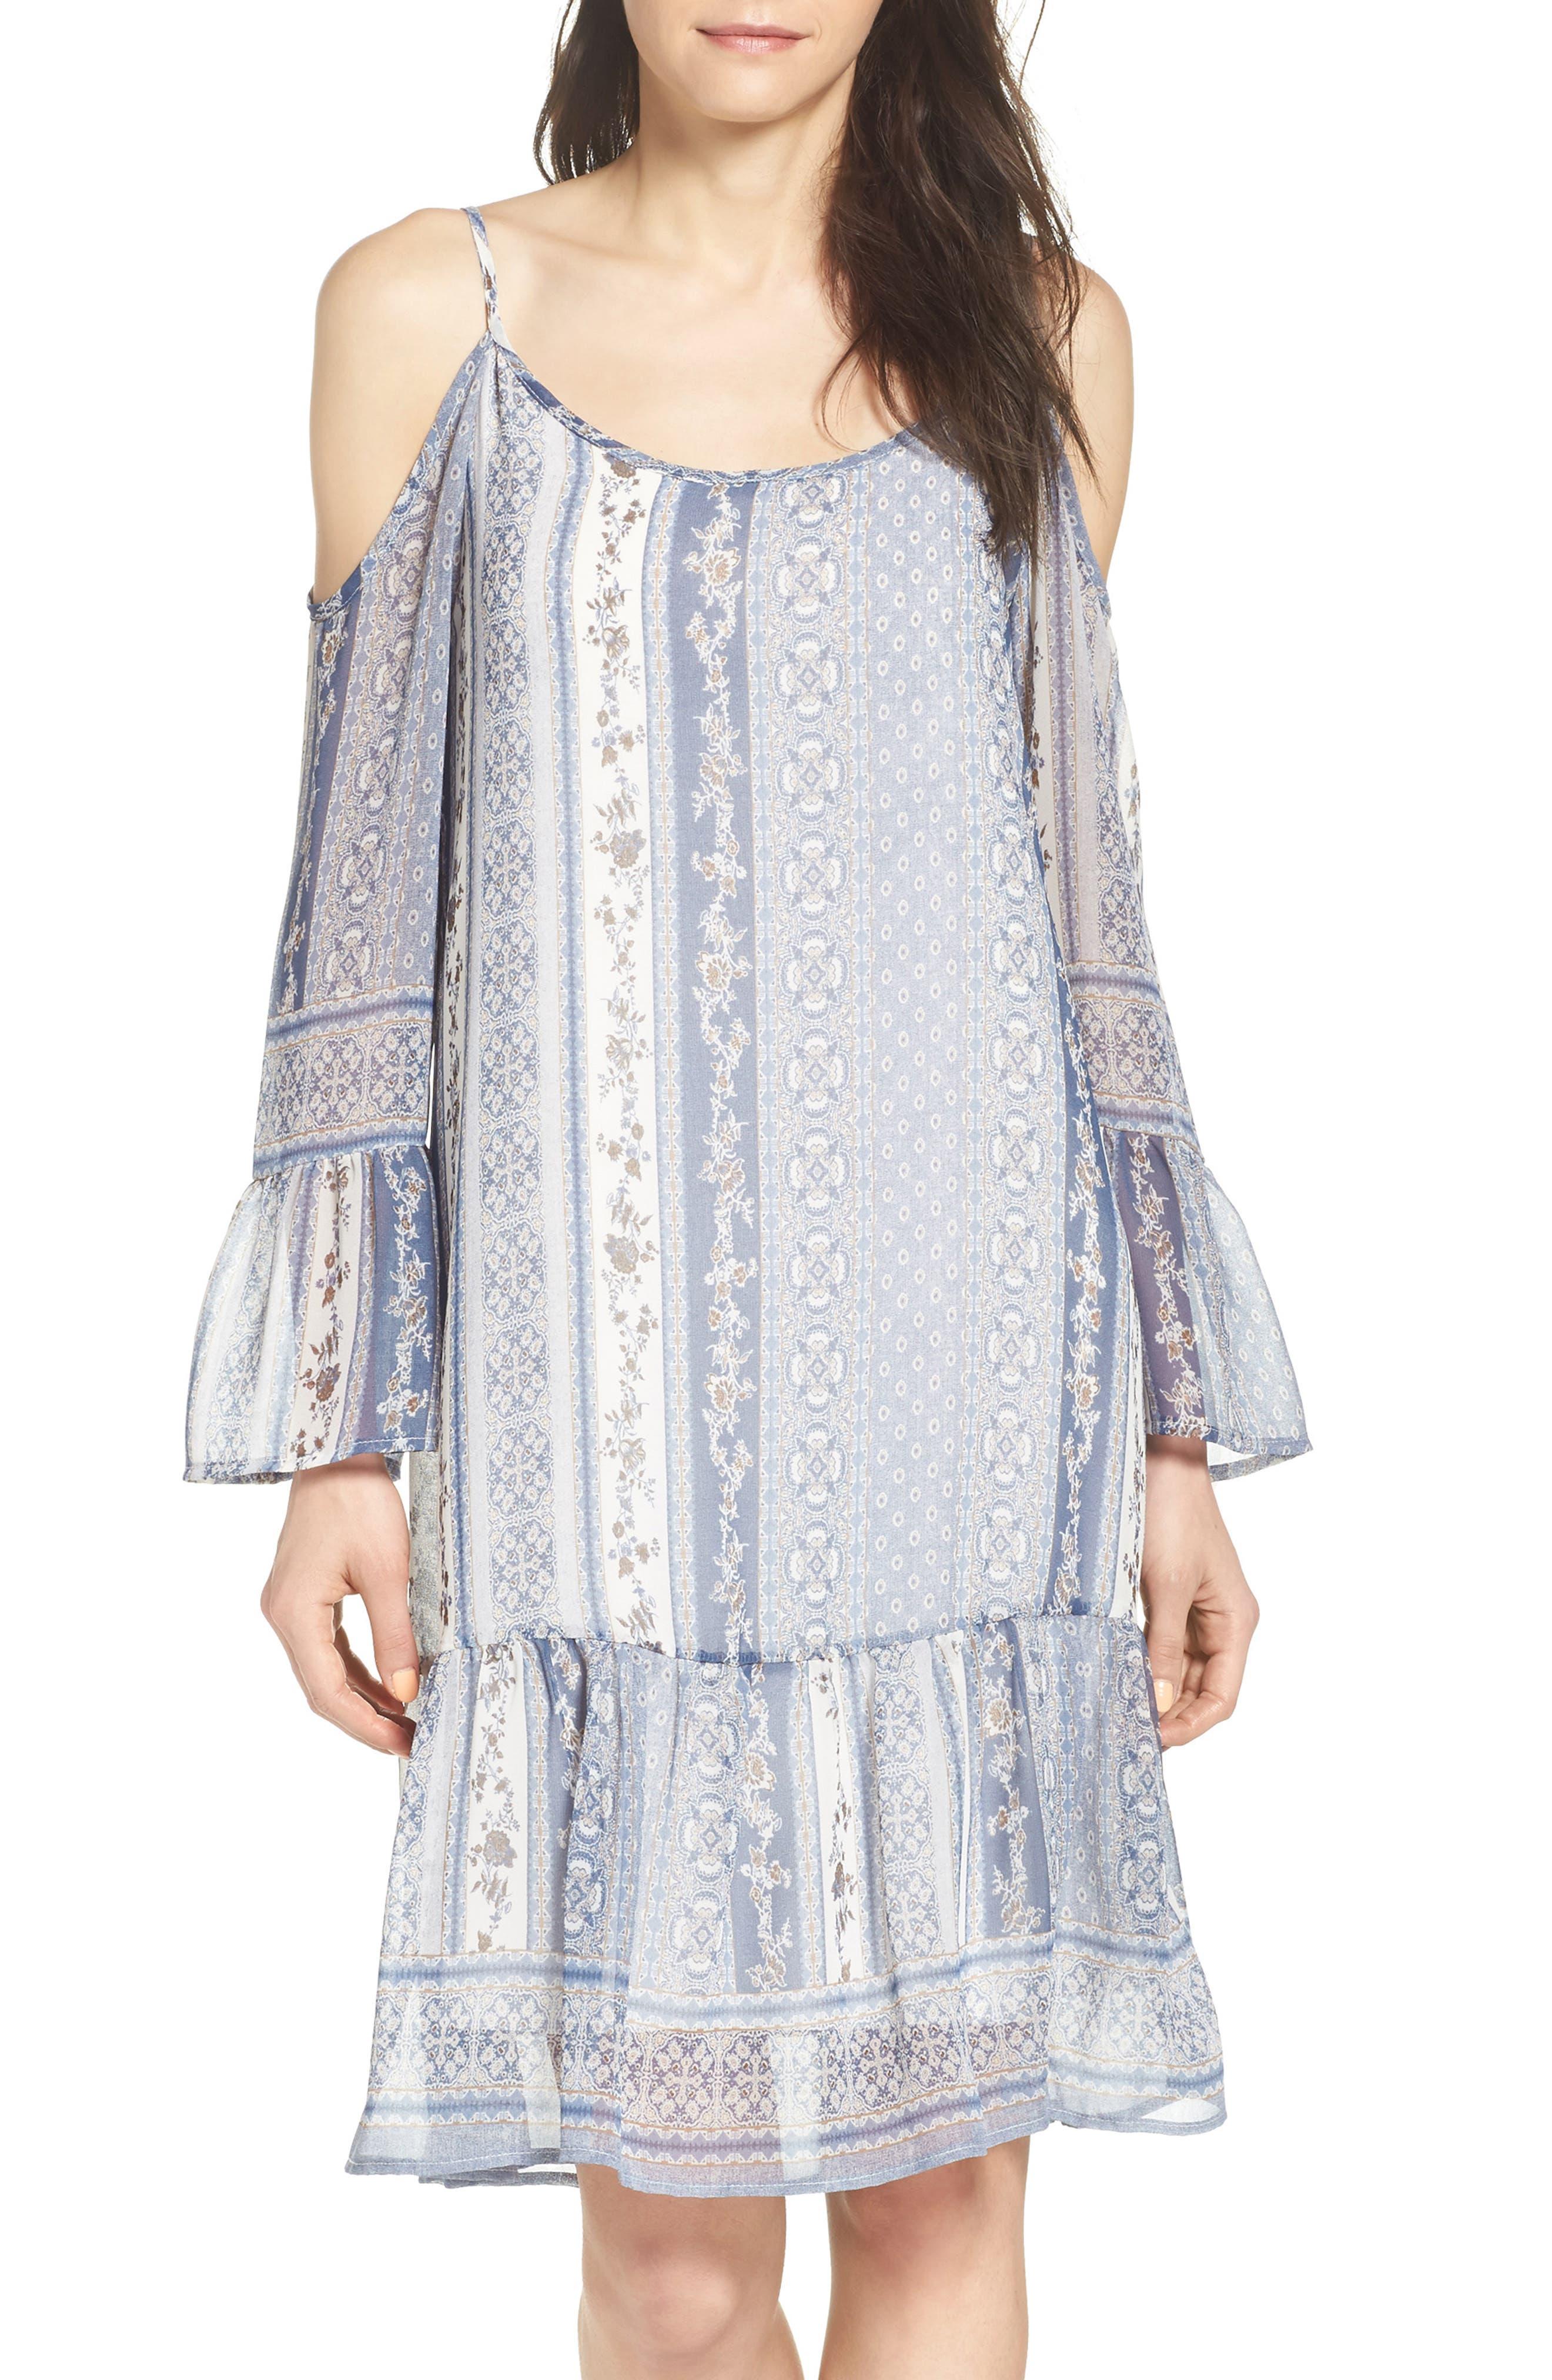 Image of Fraiche By J Printed Cold Shoulder Shift Dress